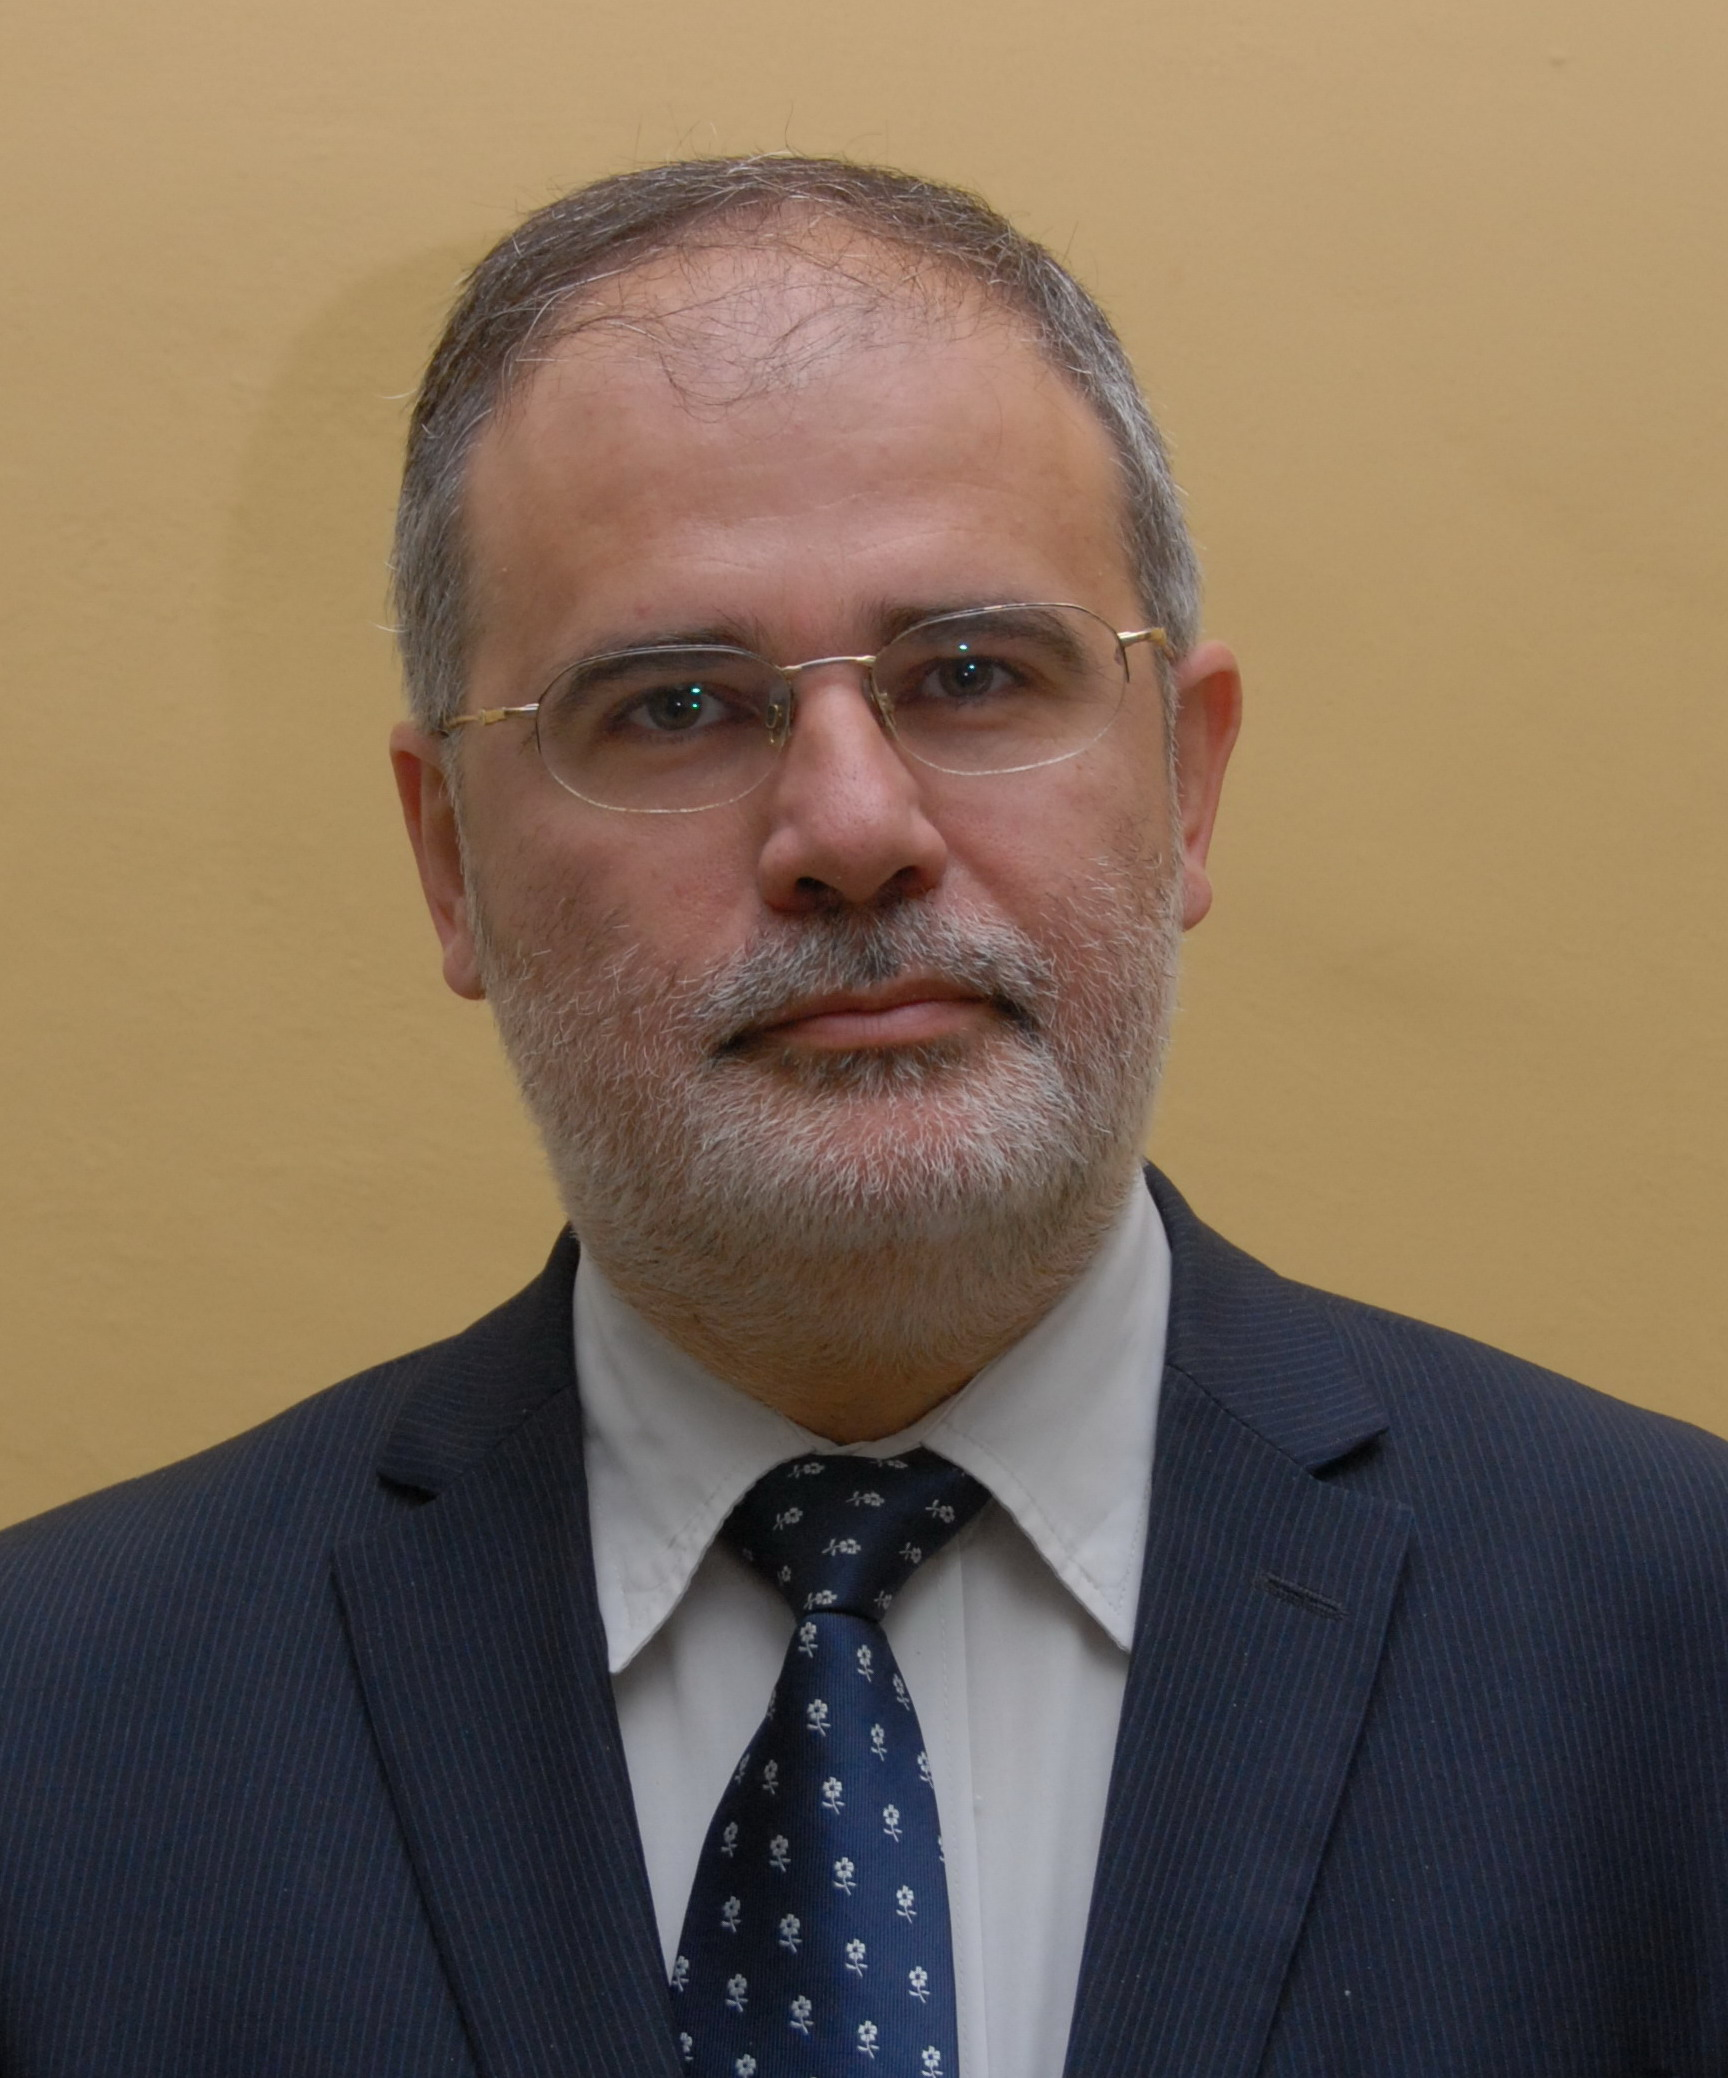 Profesorul universitar Benedek Jozsef, sursa foto: UBB Cluj